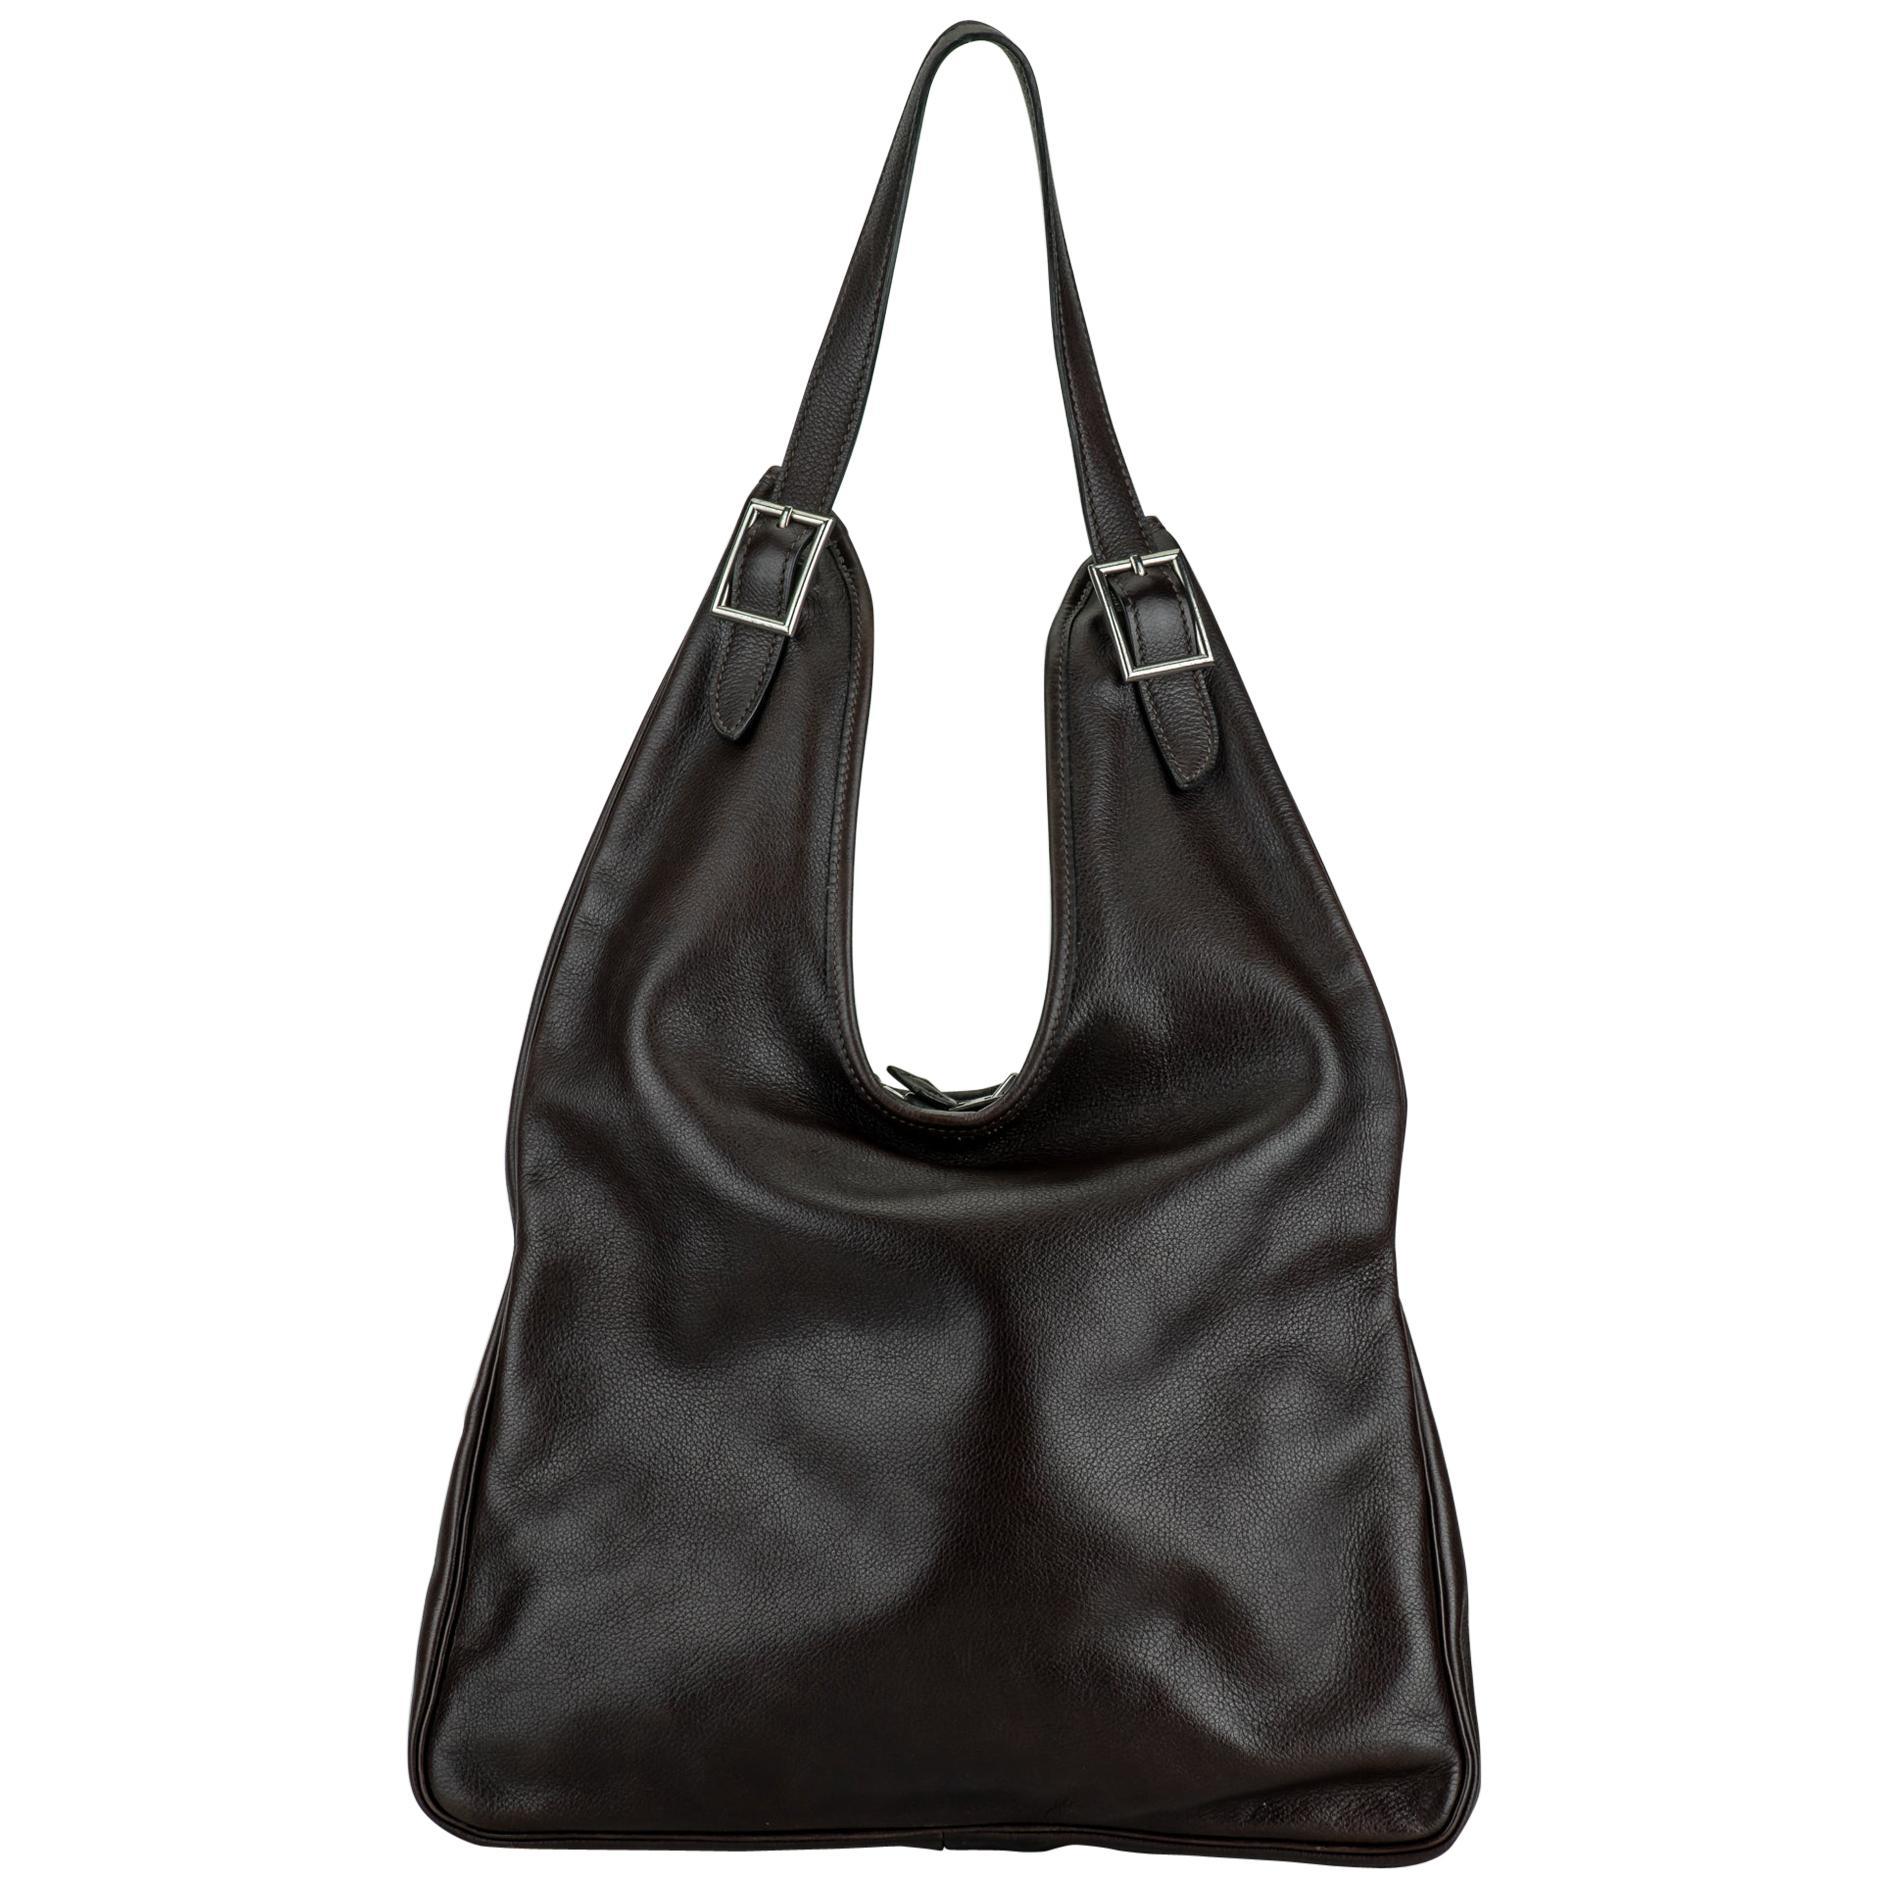 2005 Hermès Brown Masai Shoulder Bag